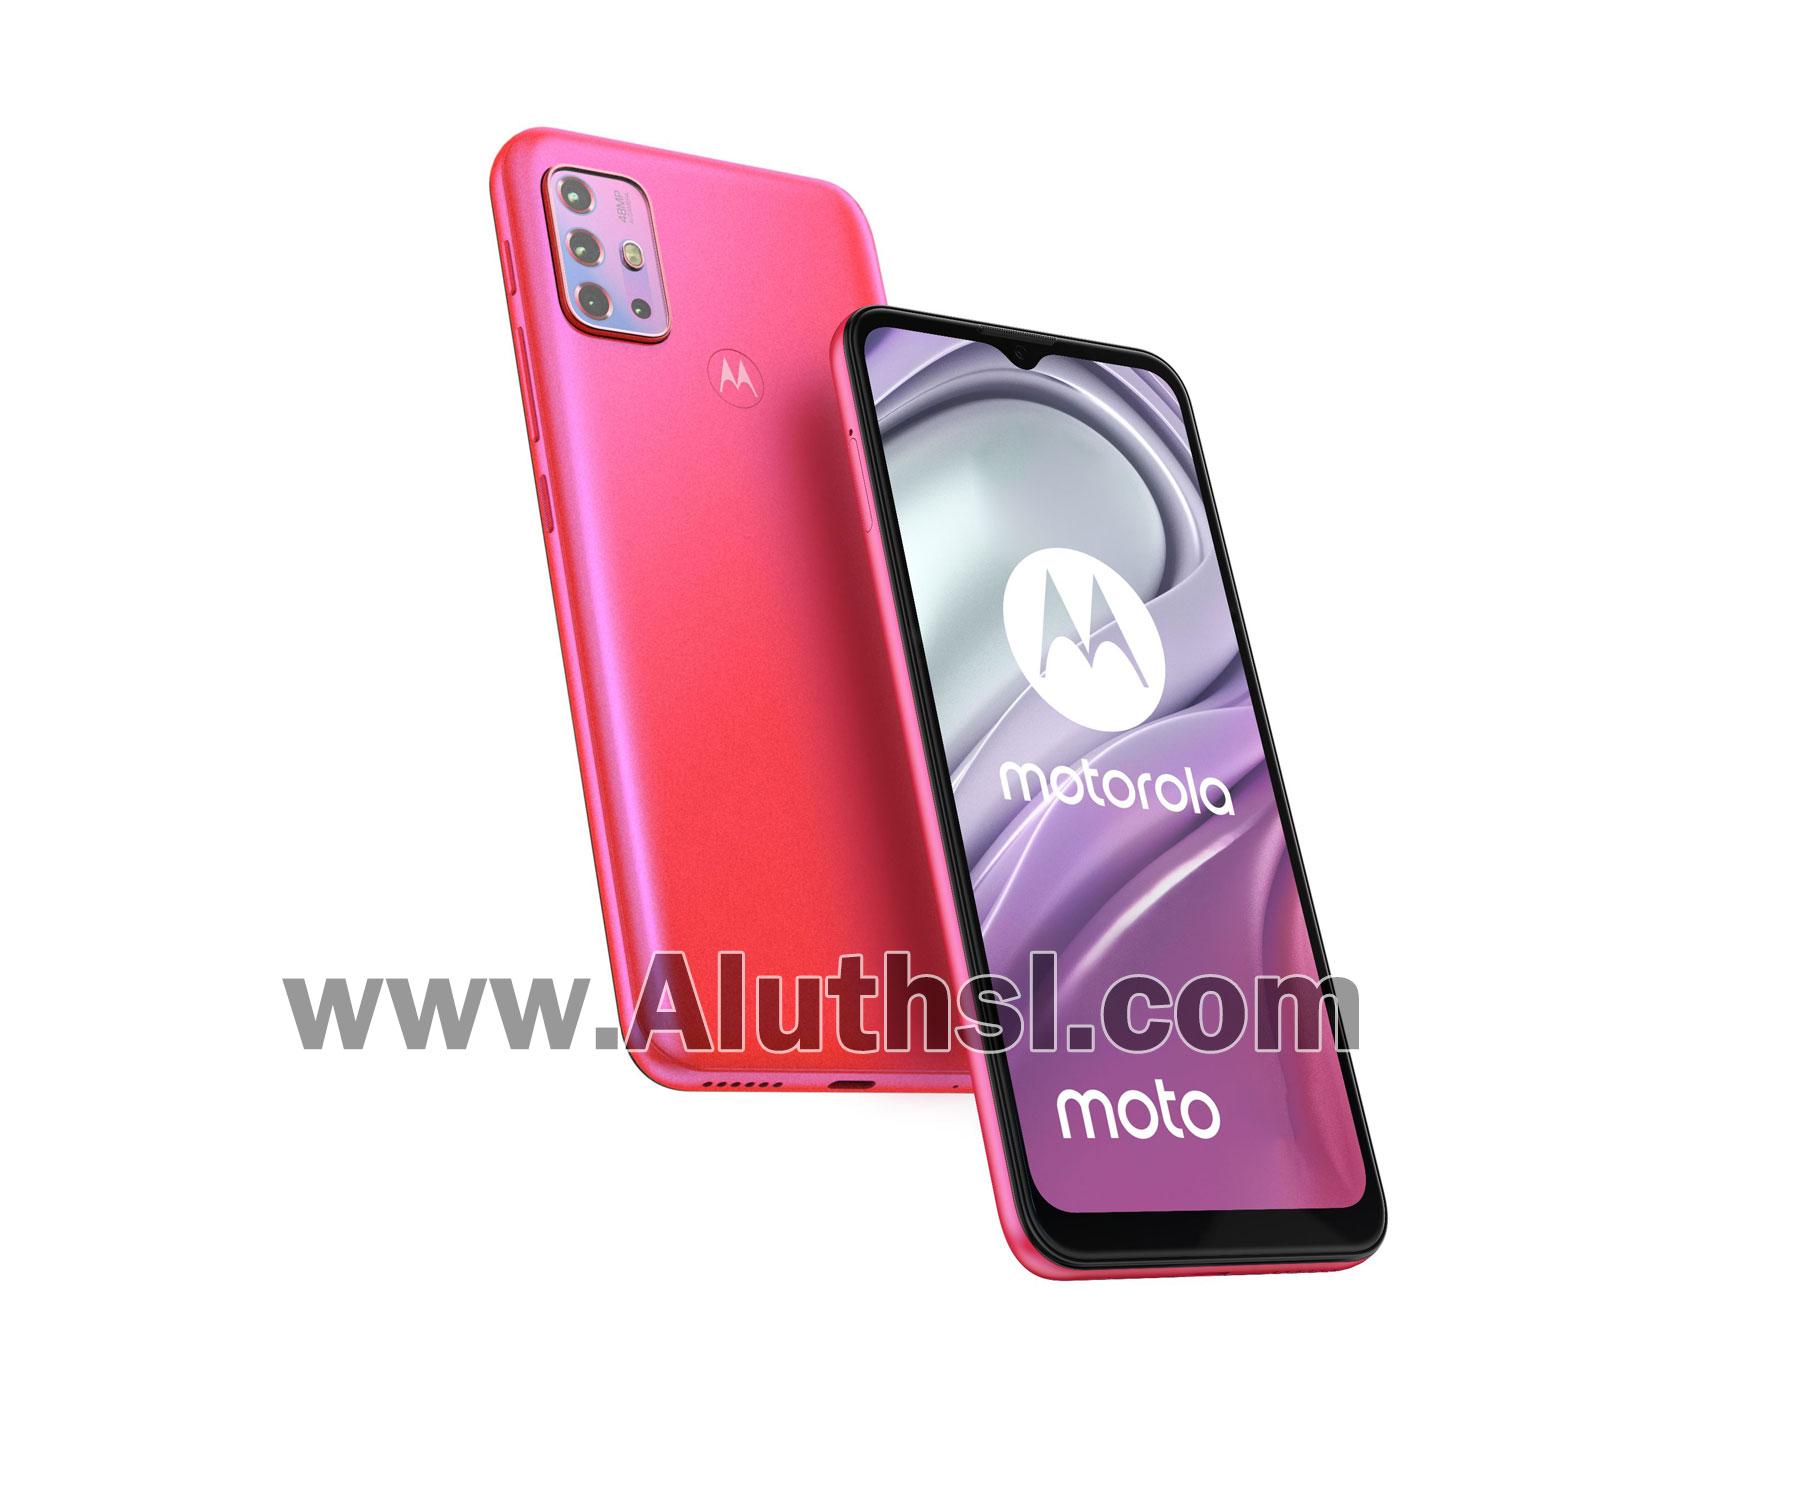 Motorola සමාගමේ අලුත්ම budget Phone එක ( Video )